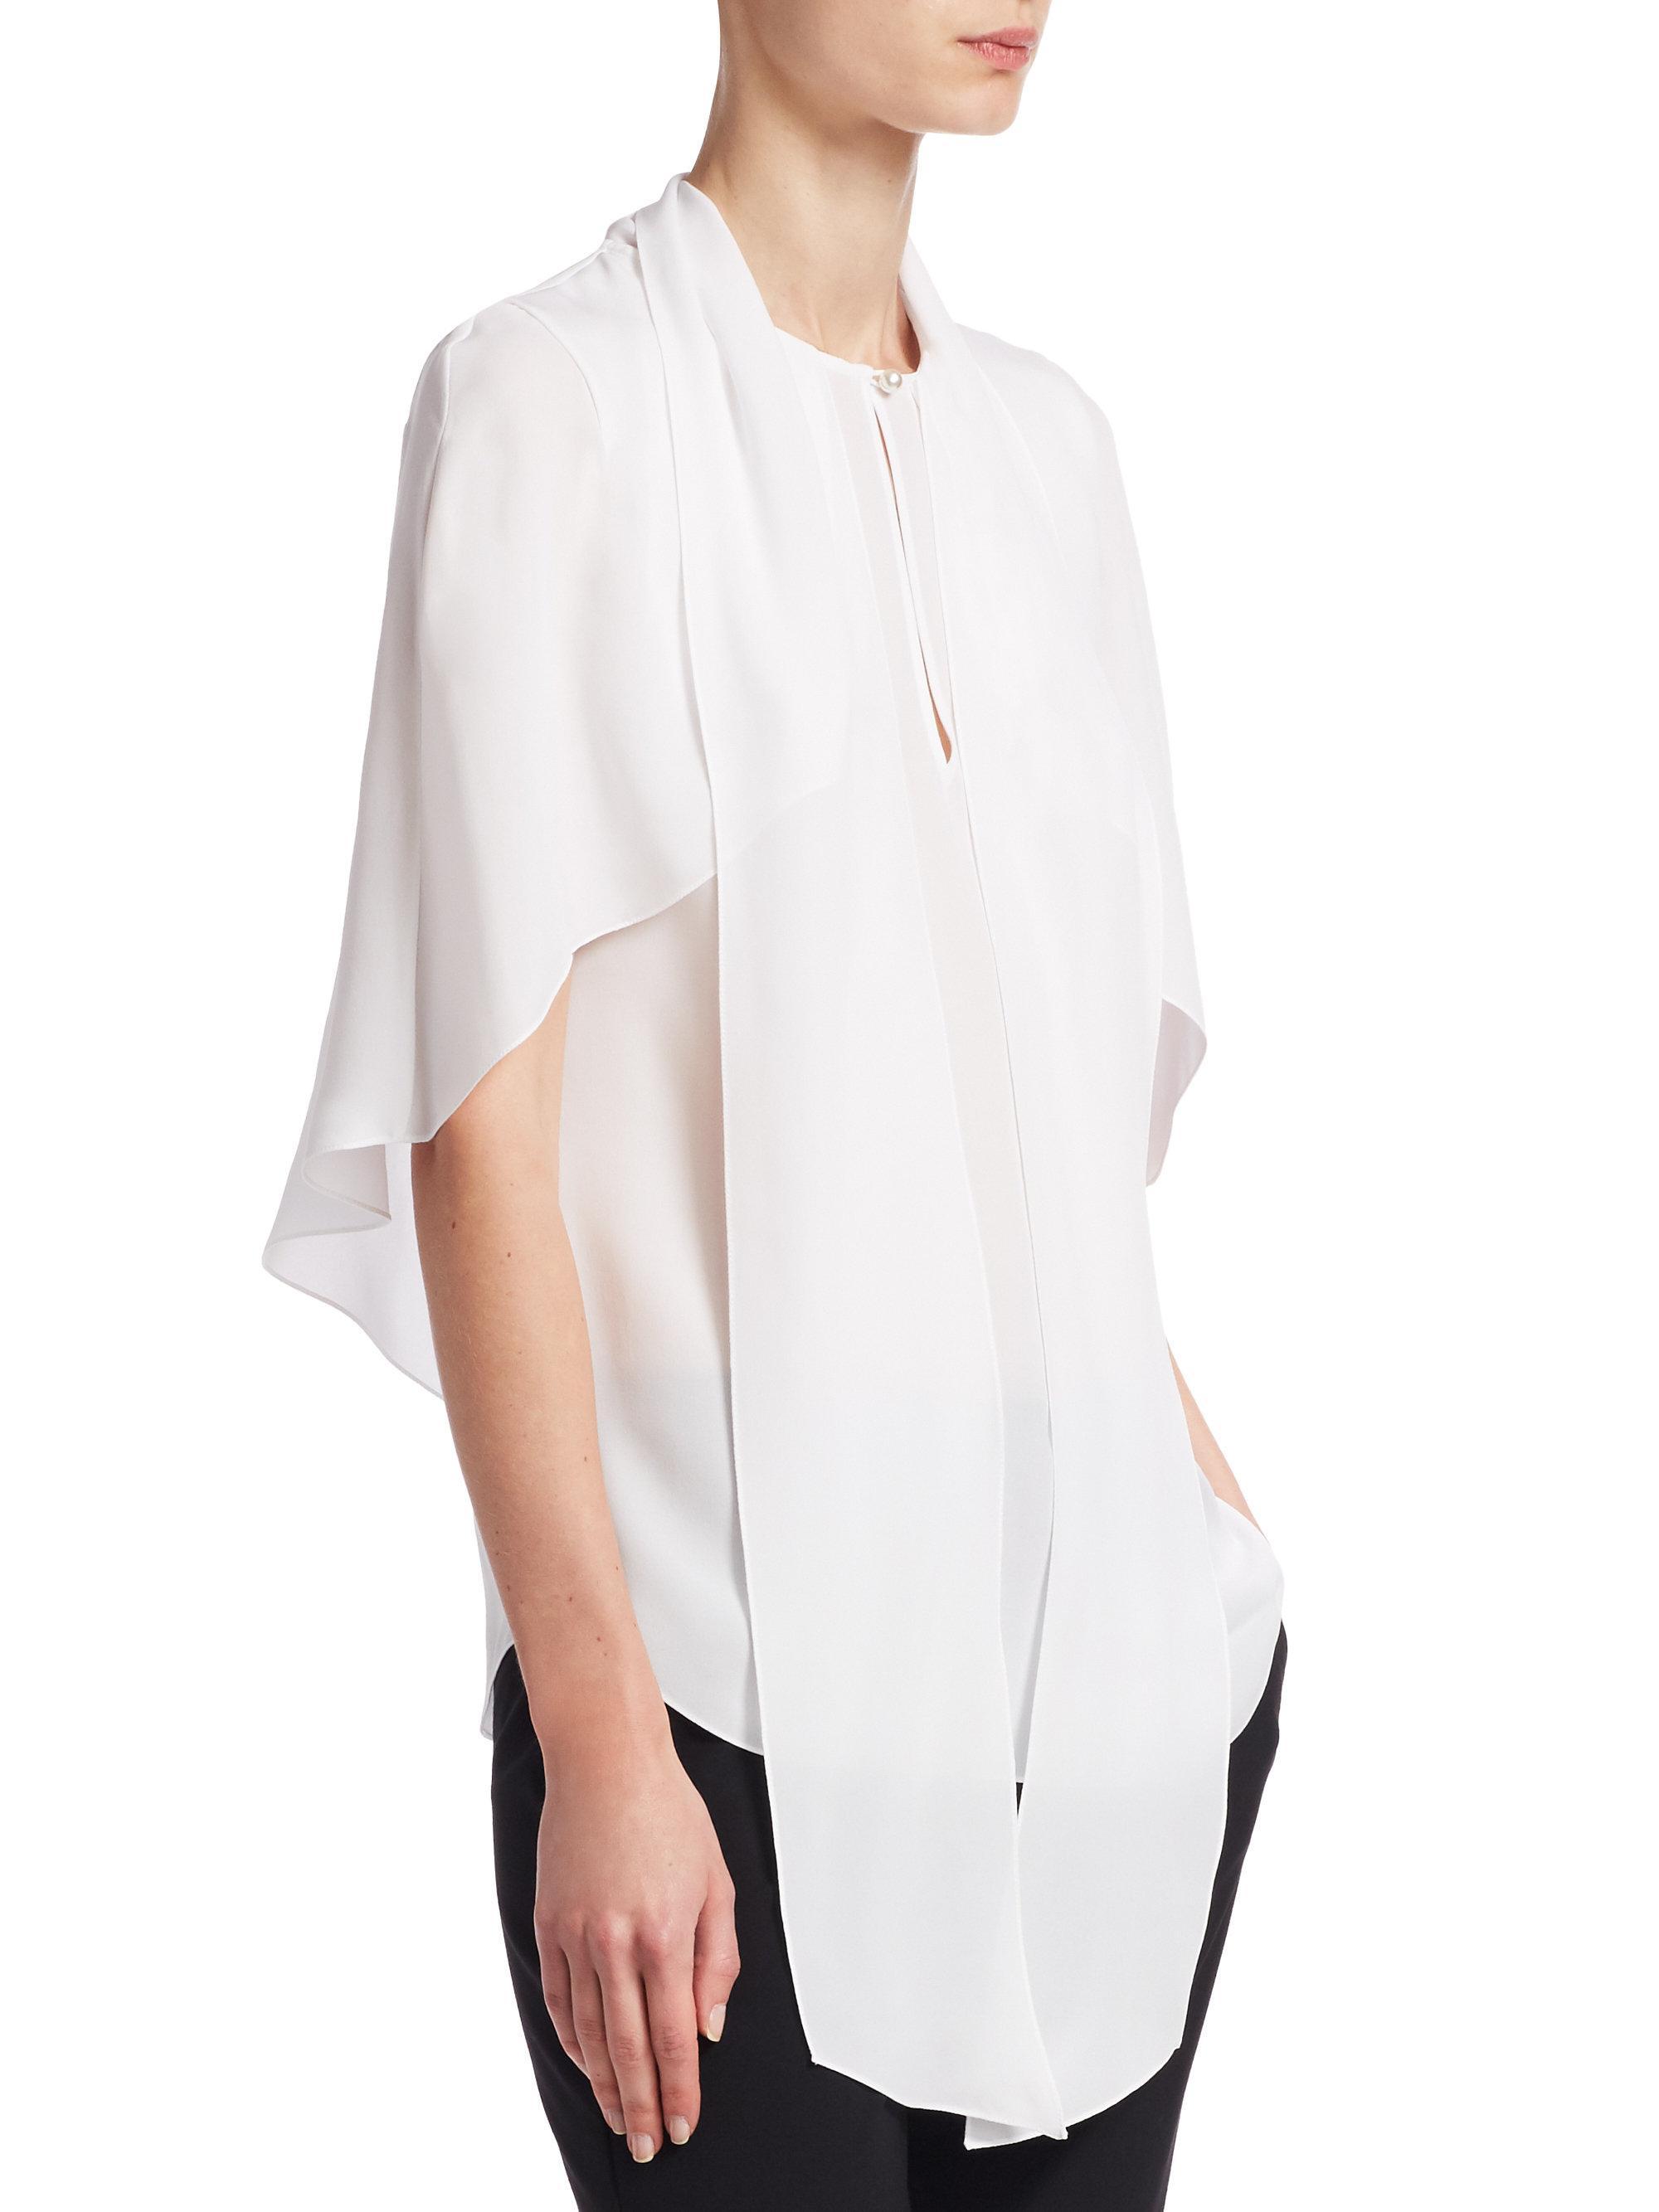 Womens Colorblocked Silk Blouse Givenchy Sale Sast Buy Cheap Cheap Cheap Explore Vckn3lSn